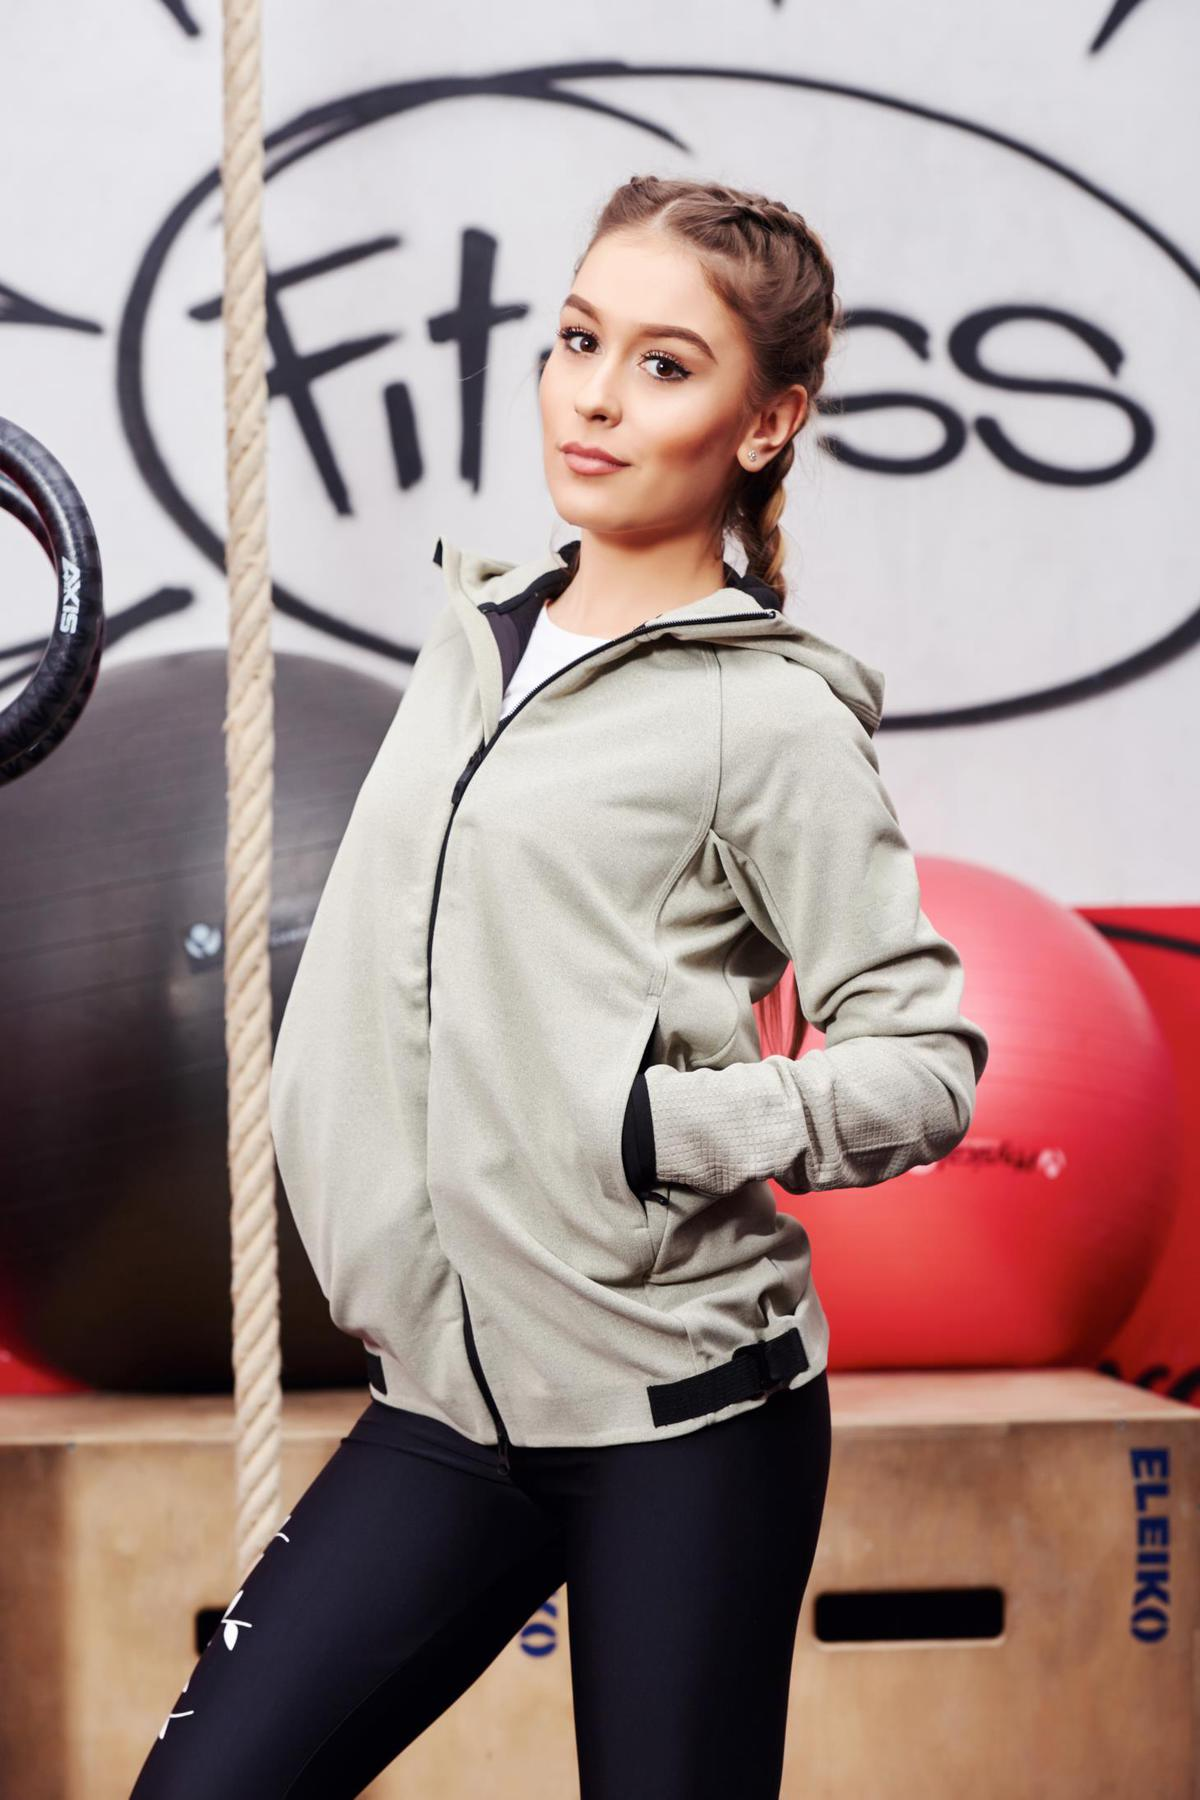 Hanorac Adidas Originals gri din material usor elastic cu buzunare cu gluga nedetasabila